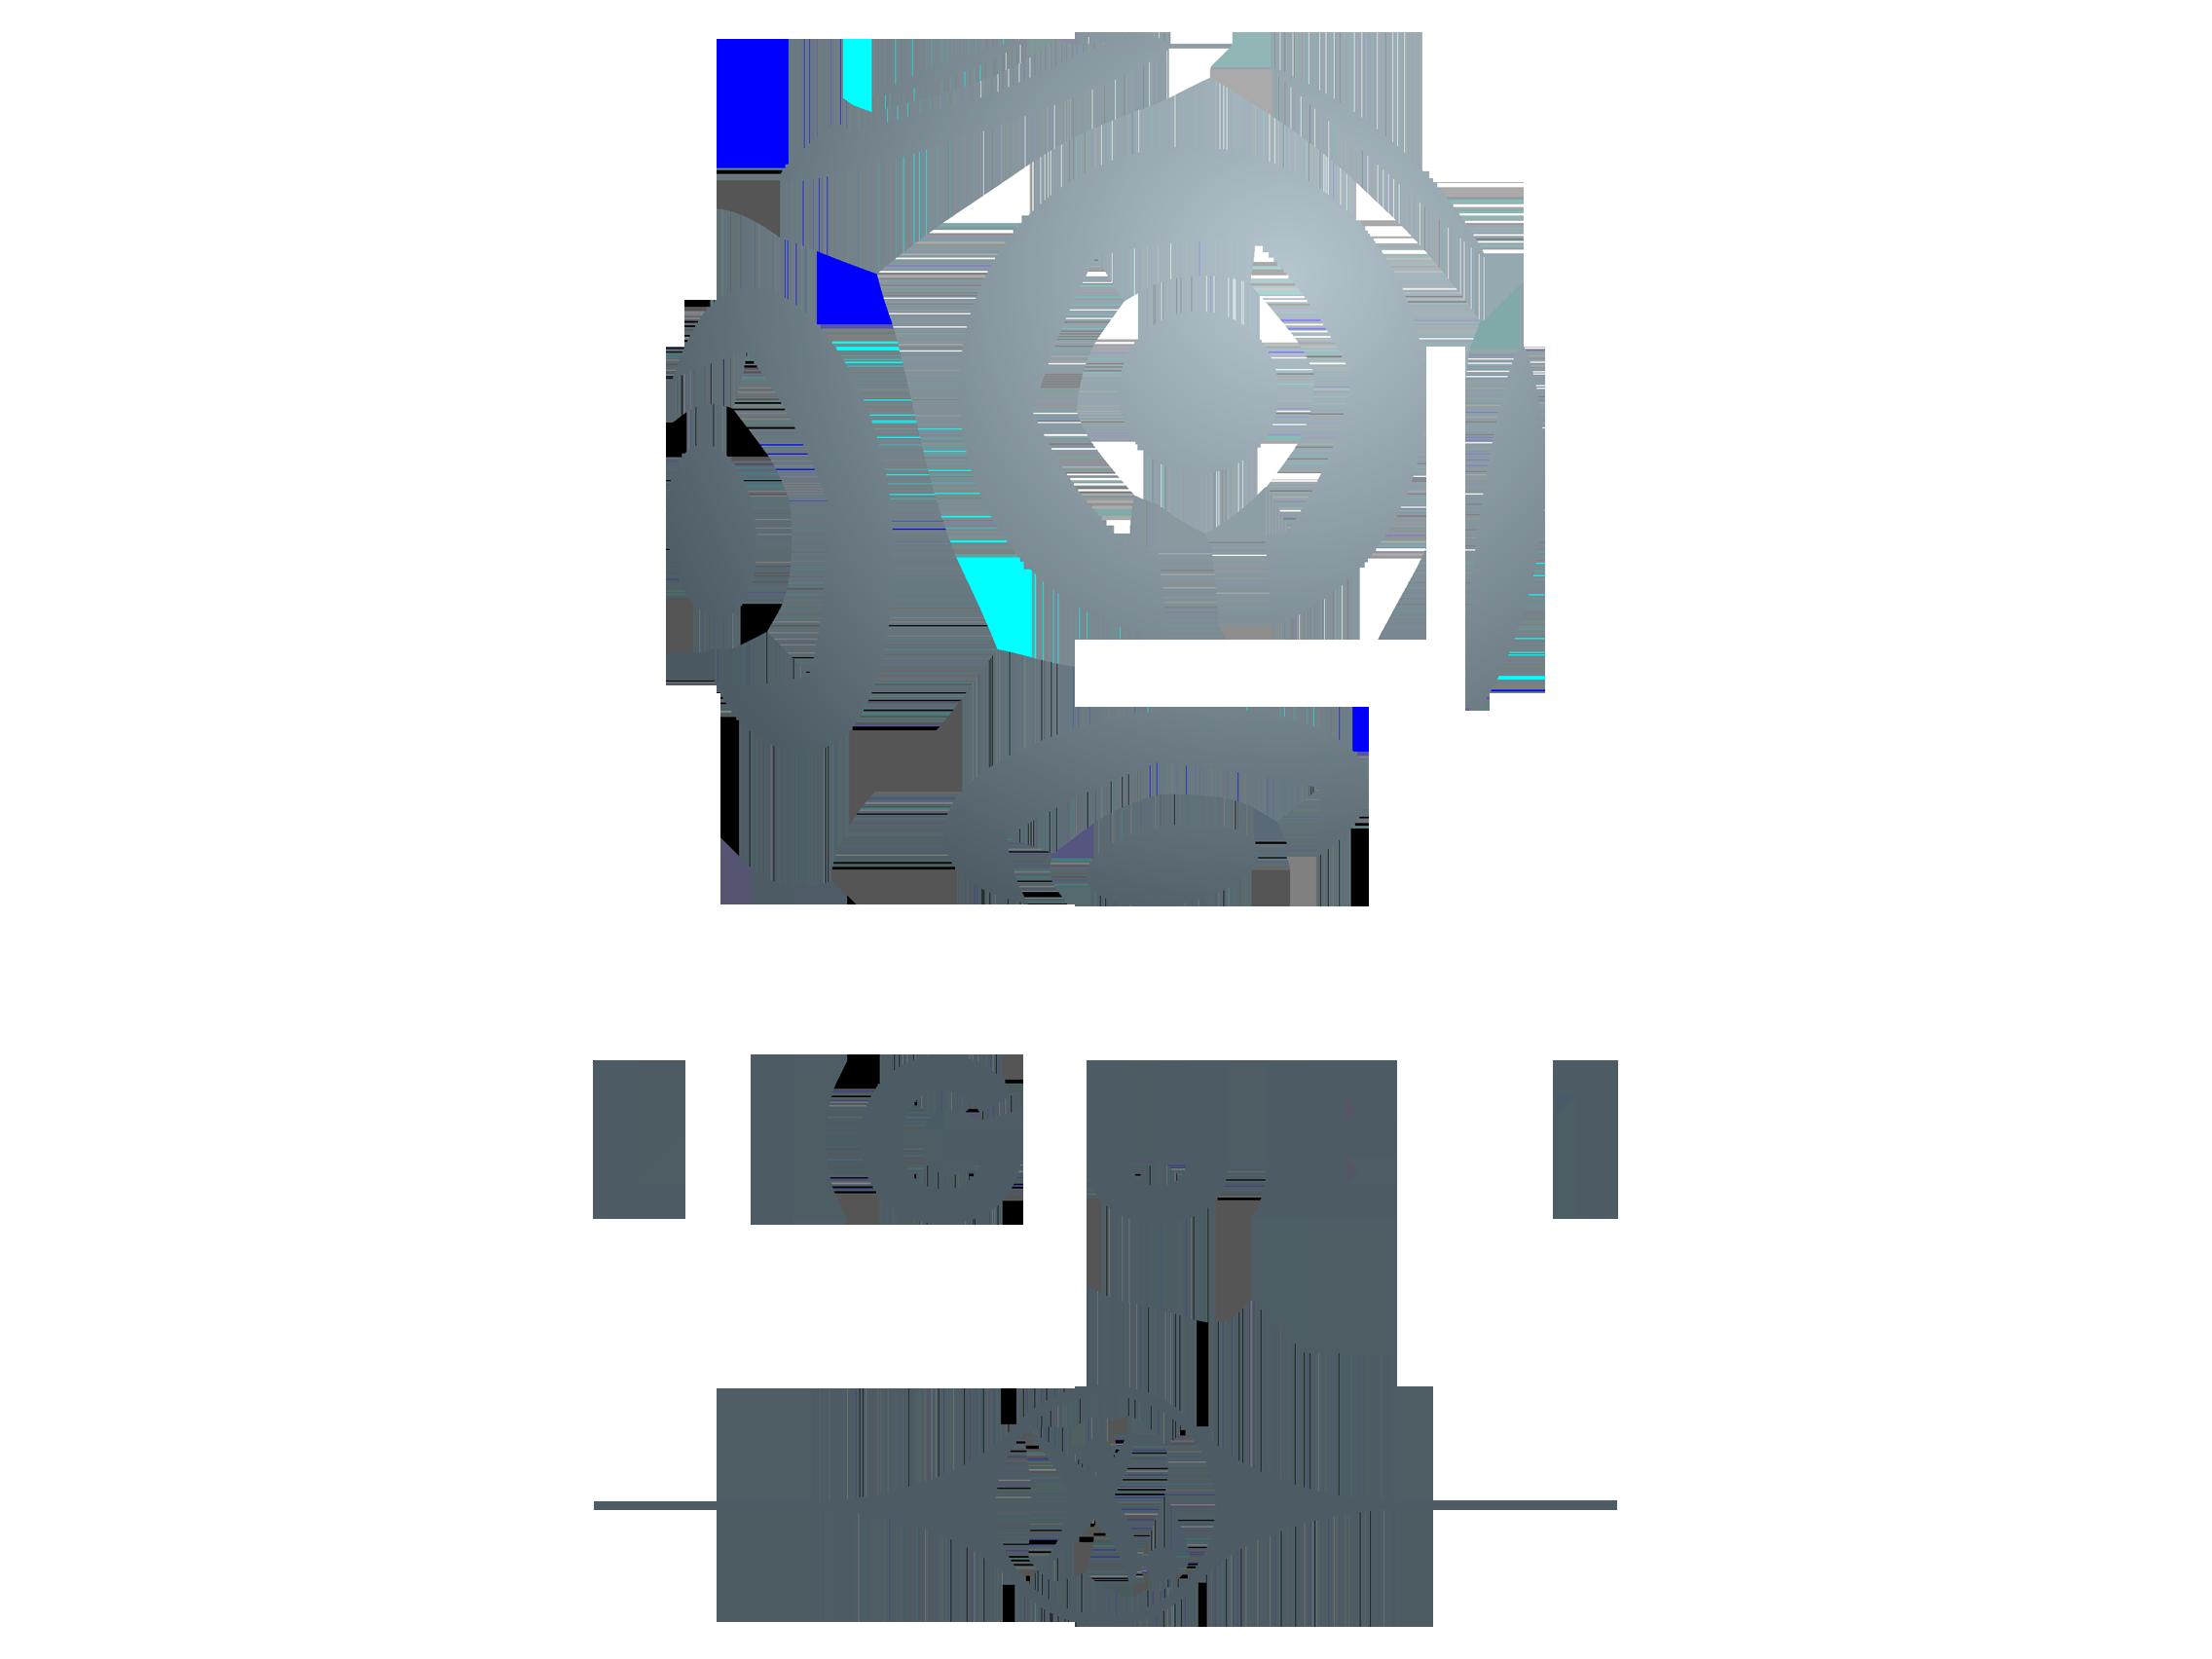 France Ligue 1 betting markets